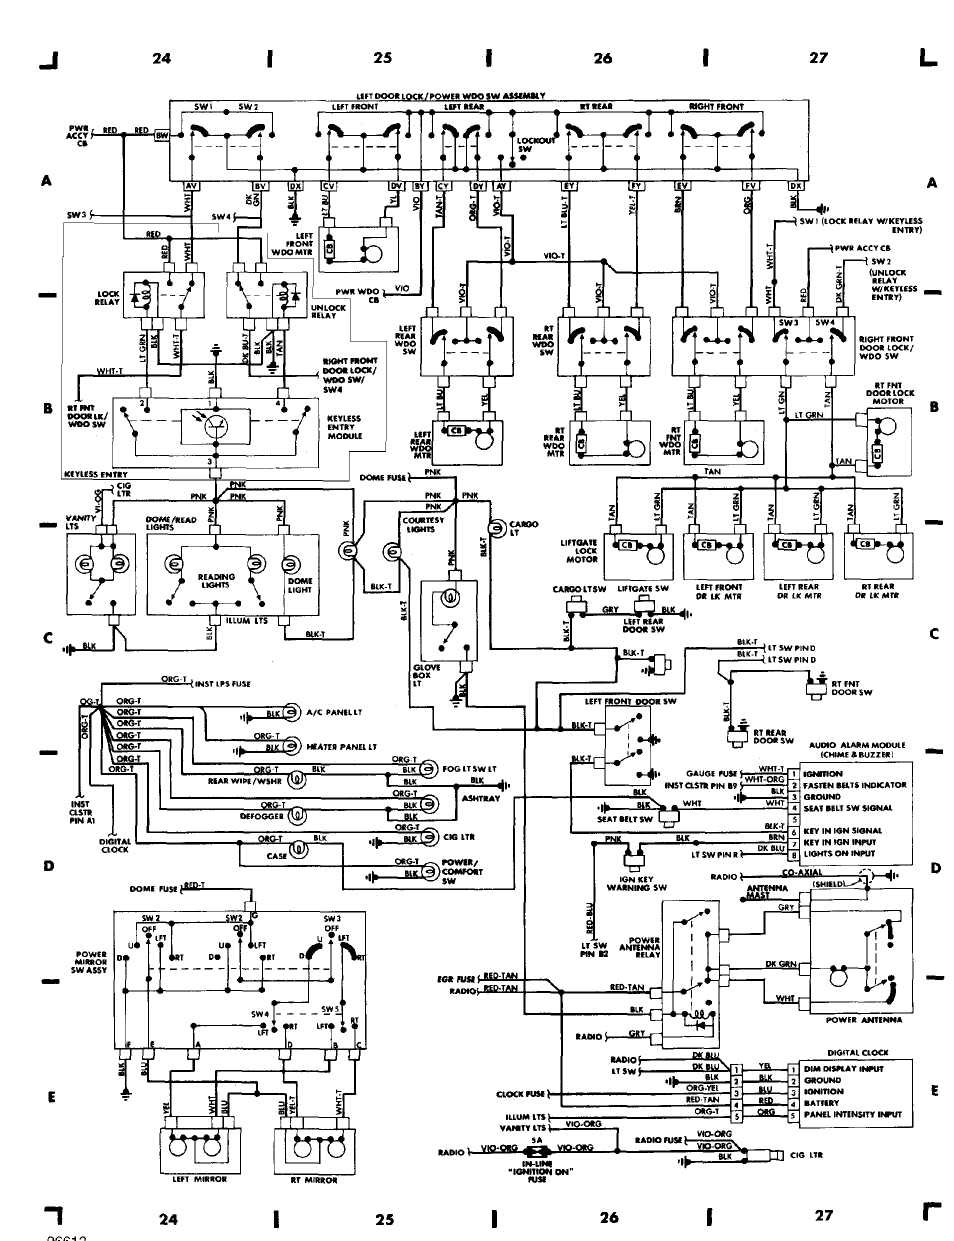 Jeep Engine Diagram | Schematic Diagram - 1995 Jeep Cherokee Wiring Diagram